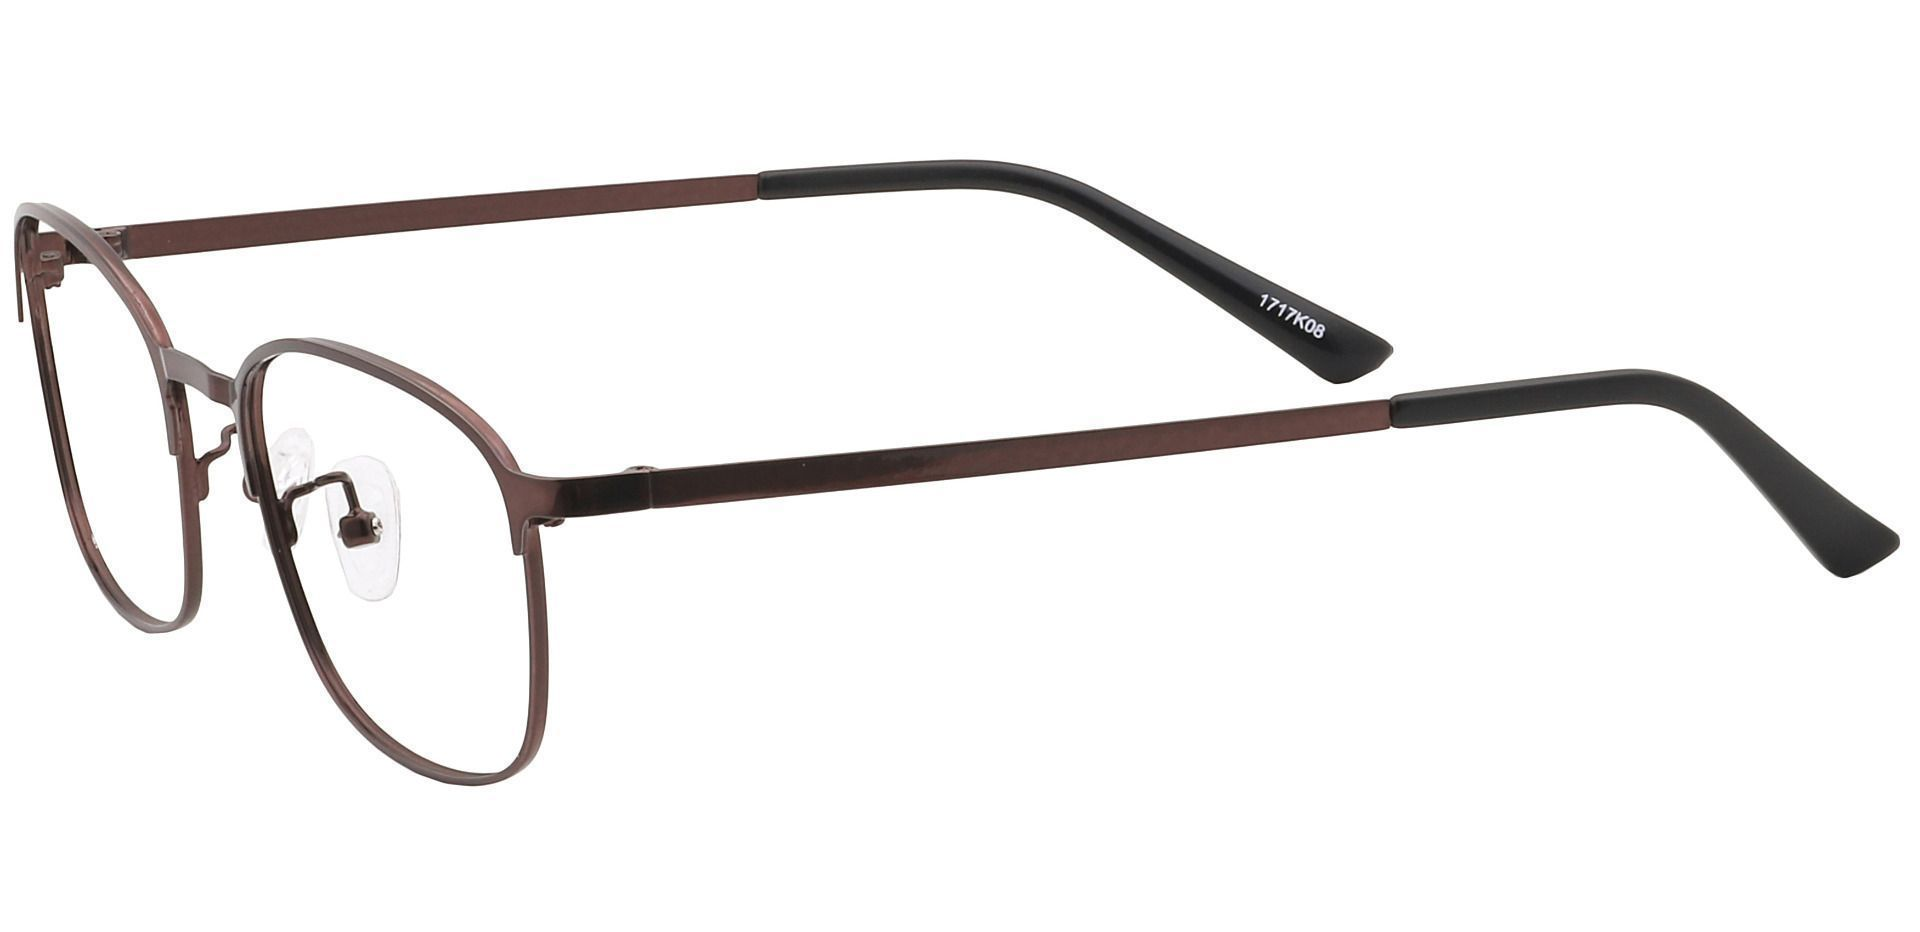 Carmen Square Non-Rx Glasses - Black